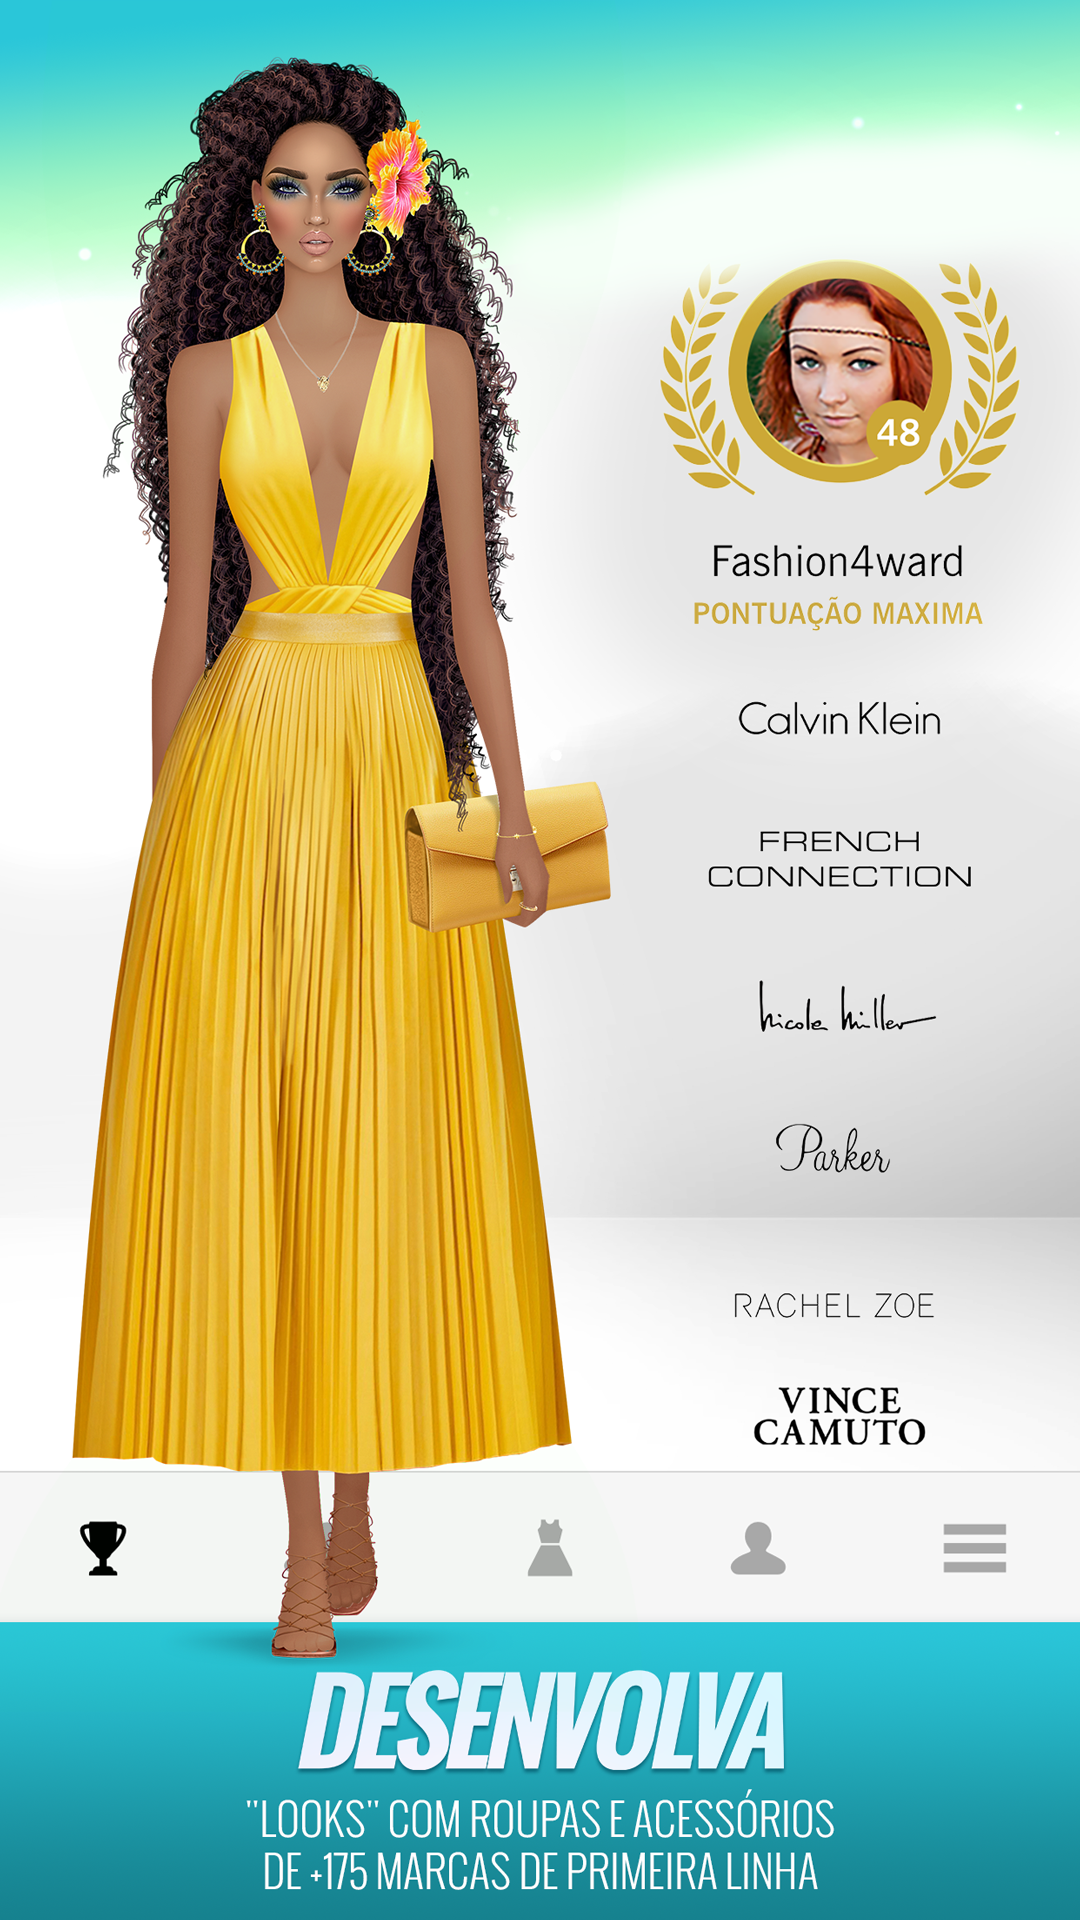 Covet Fashion, o jogo de moda: Amazon.com.br: Amazon Appstore